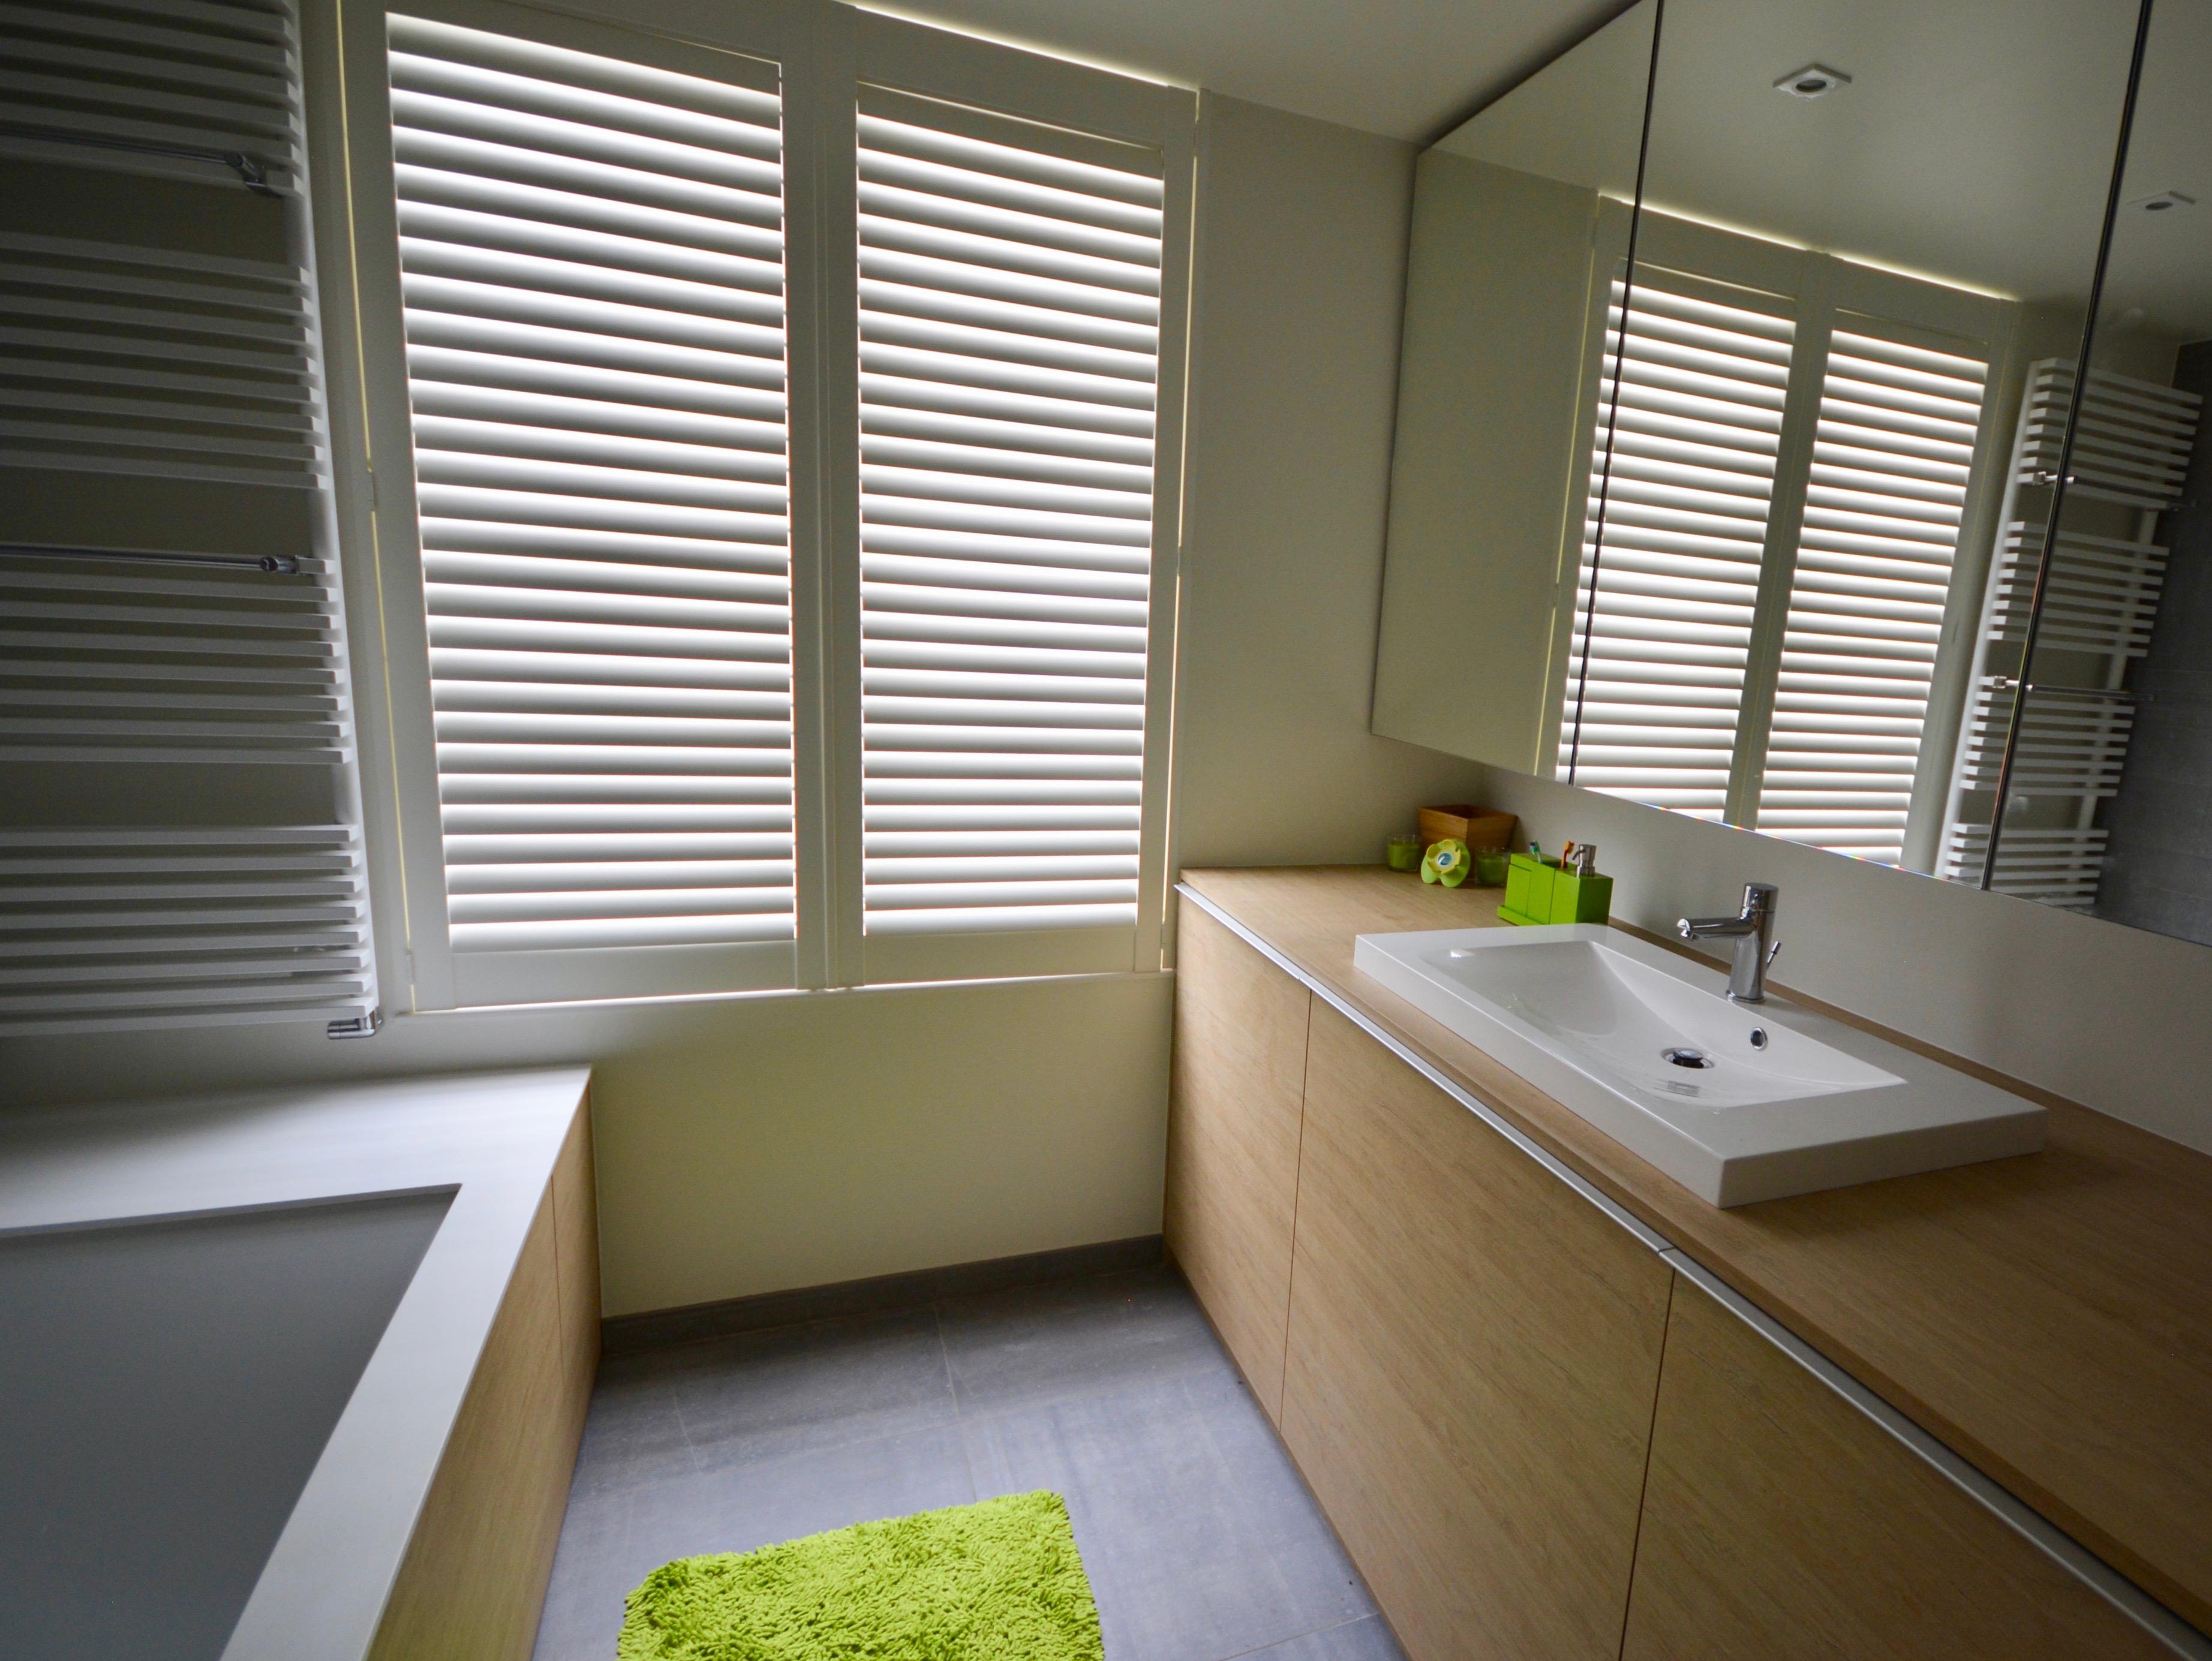 Badkamer Met Hout : Zo gebruik je hout in de badkamer luxaflex